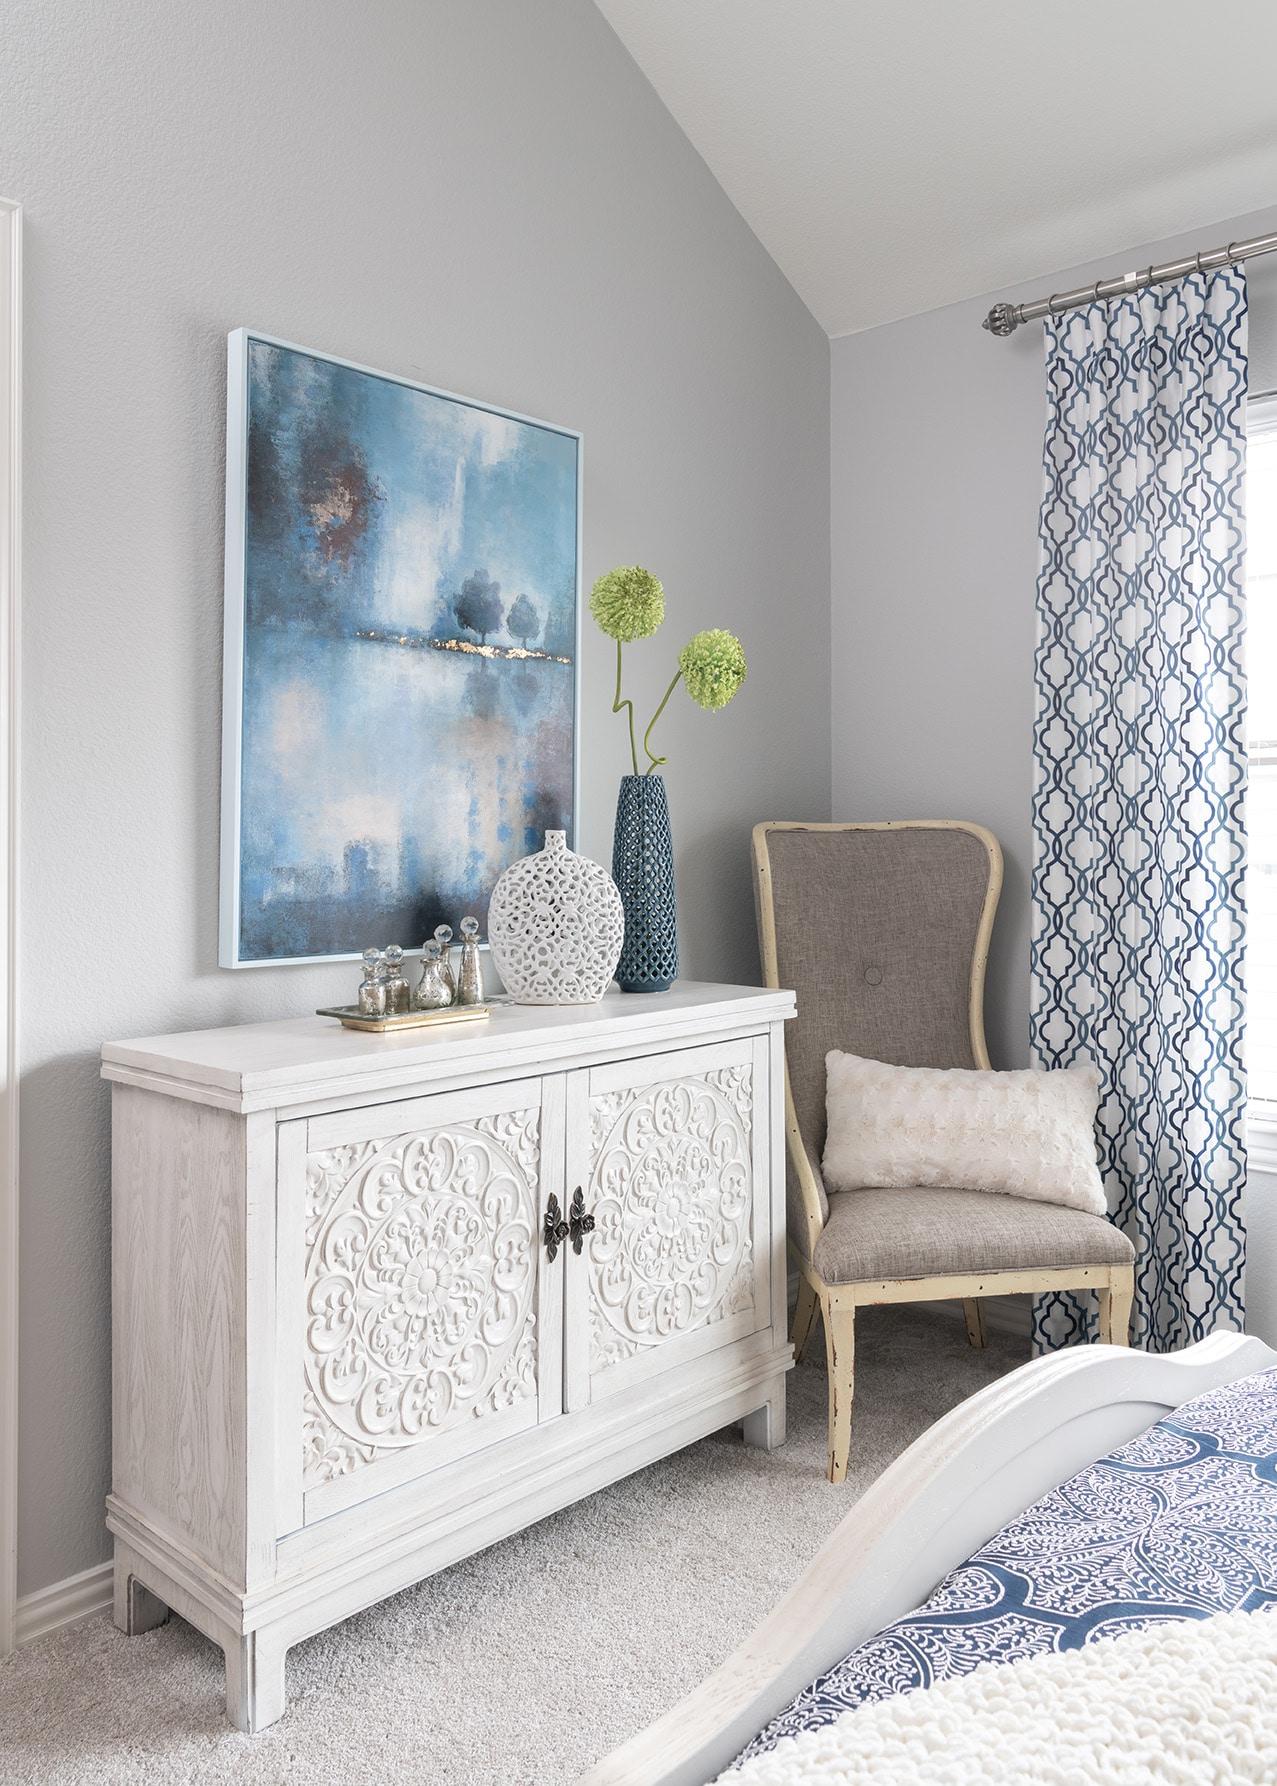 Guest Bedroom Ideas, Guest Bedroom Decor, Guest Bedroom Furniture, Guest bedroom decorating ideas,